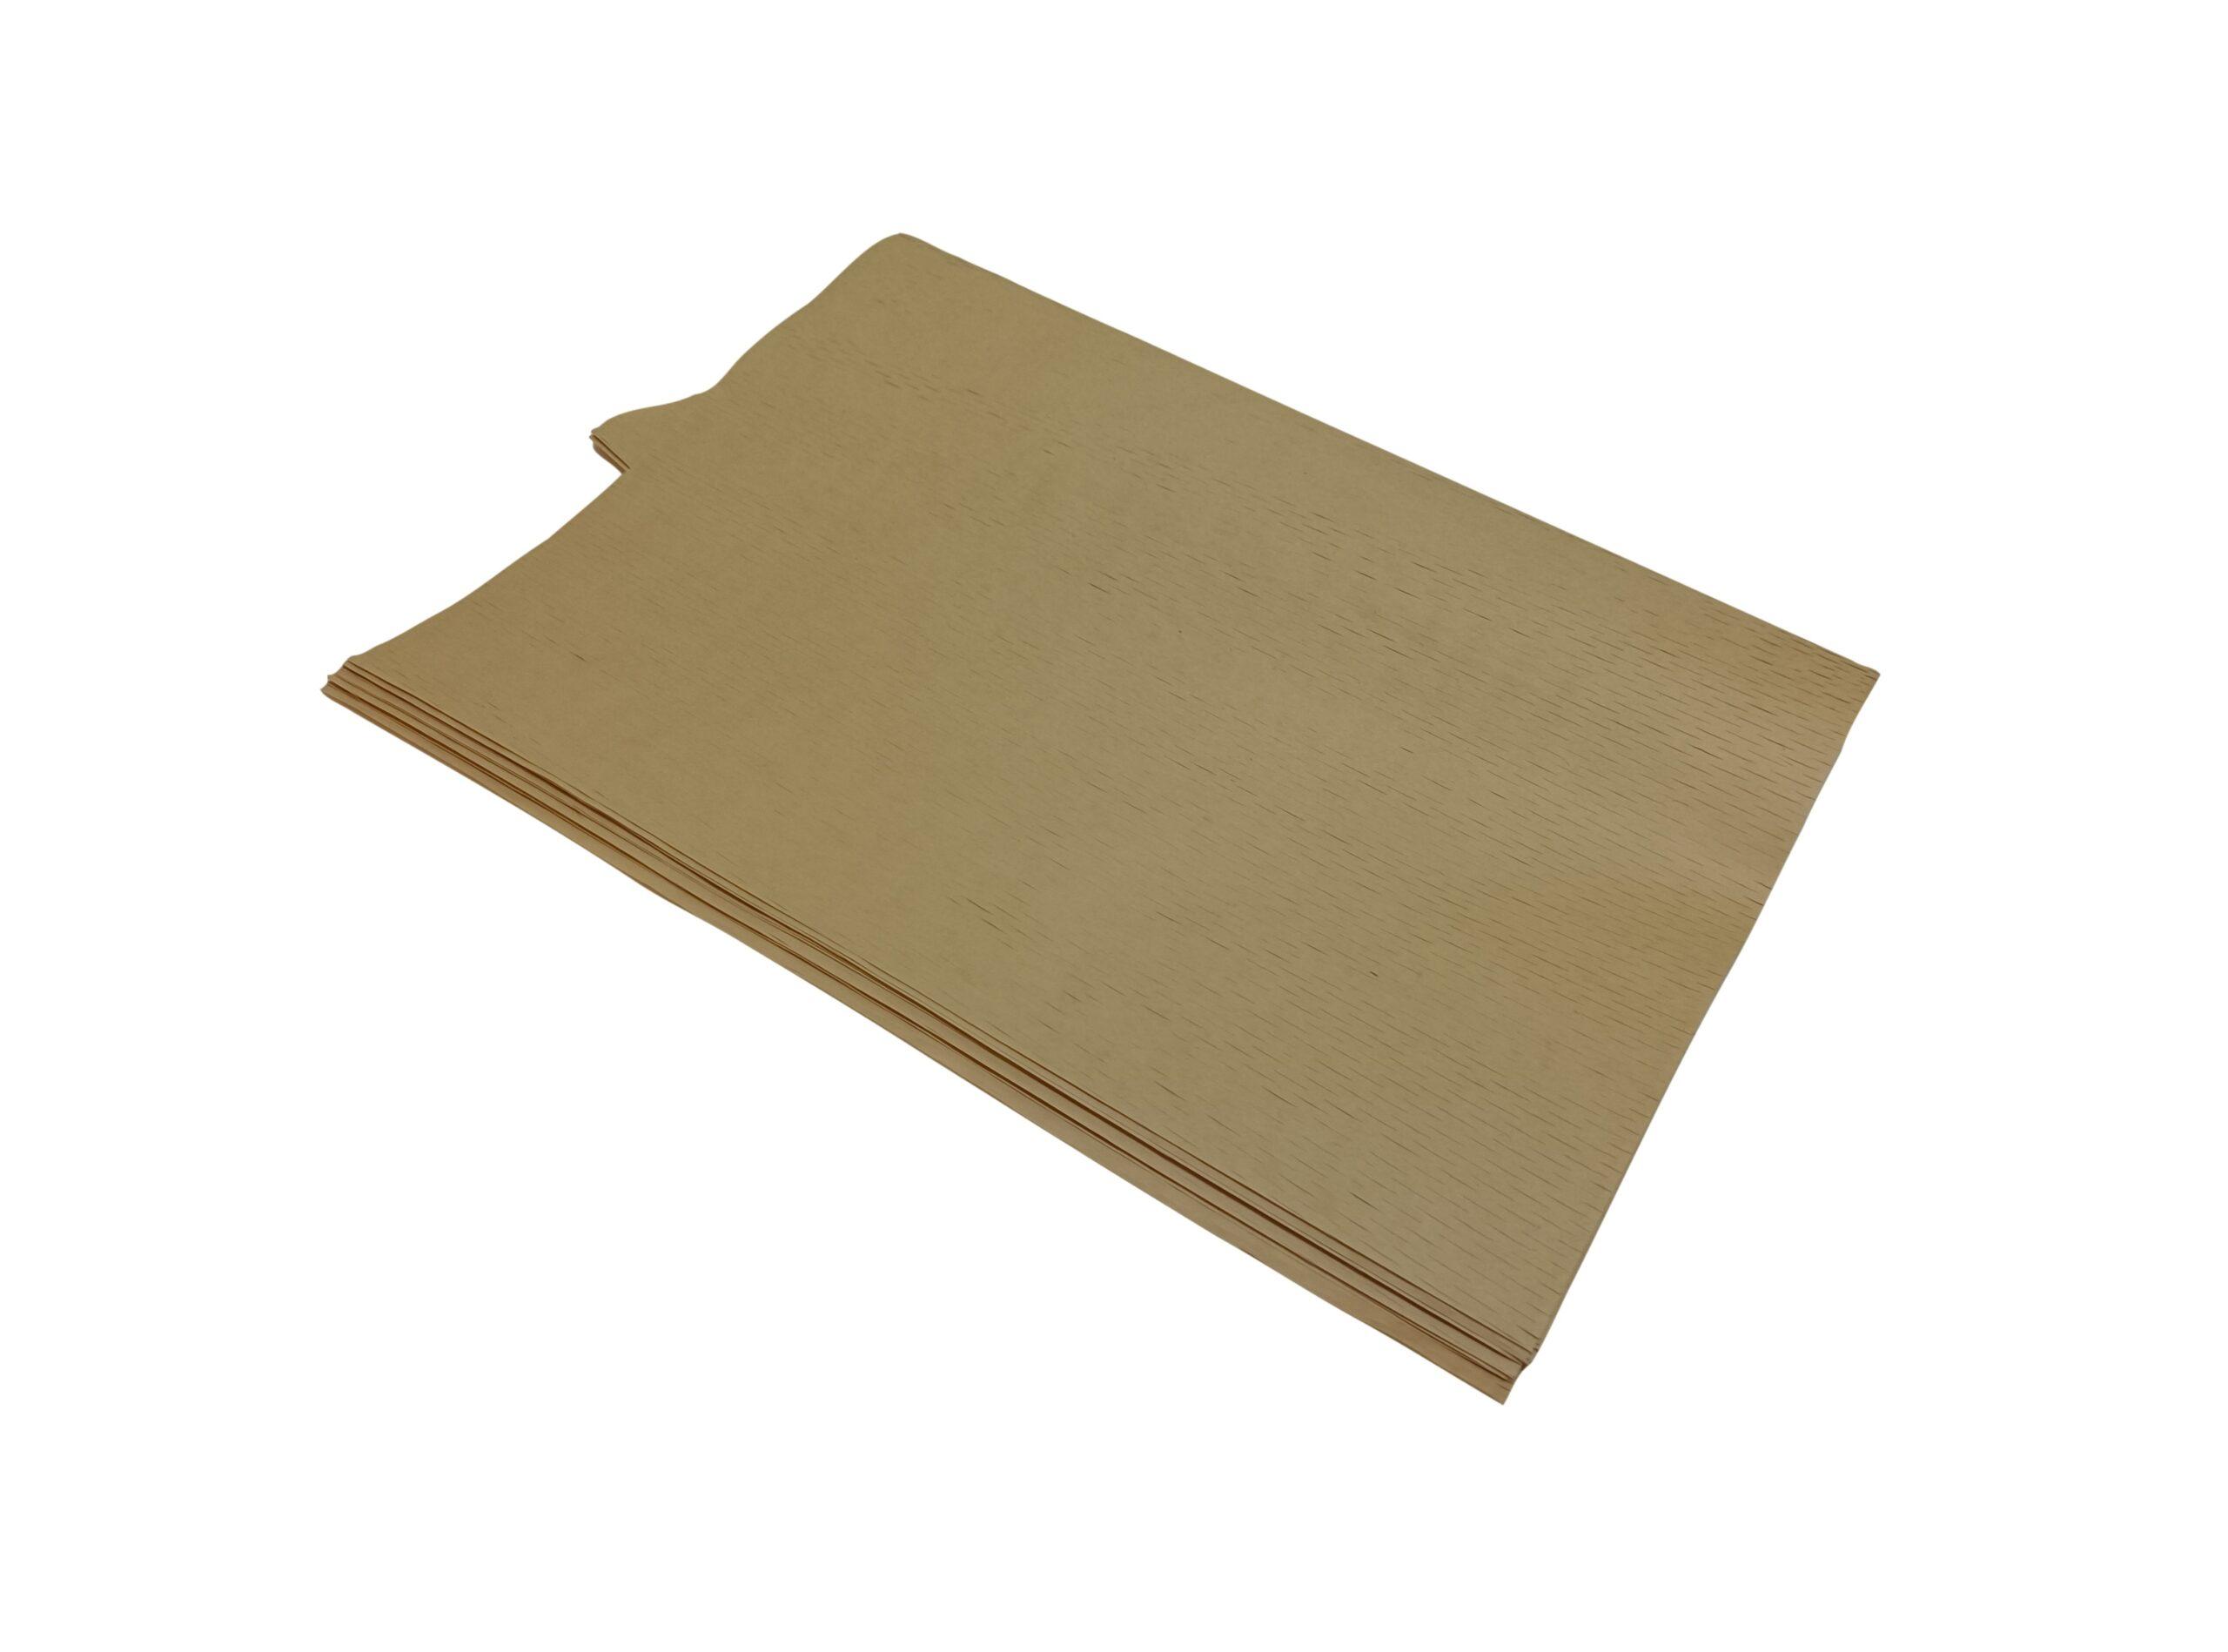 12 inch x 20 inch Honeycomb Cushion Wrap 40 sheets